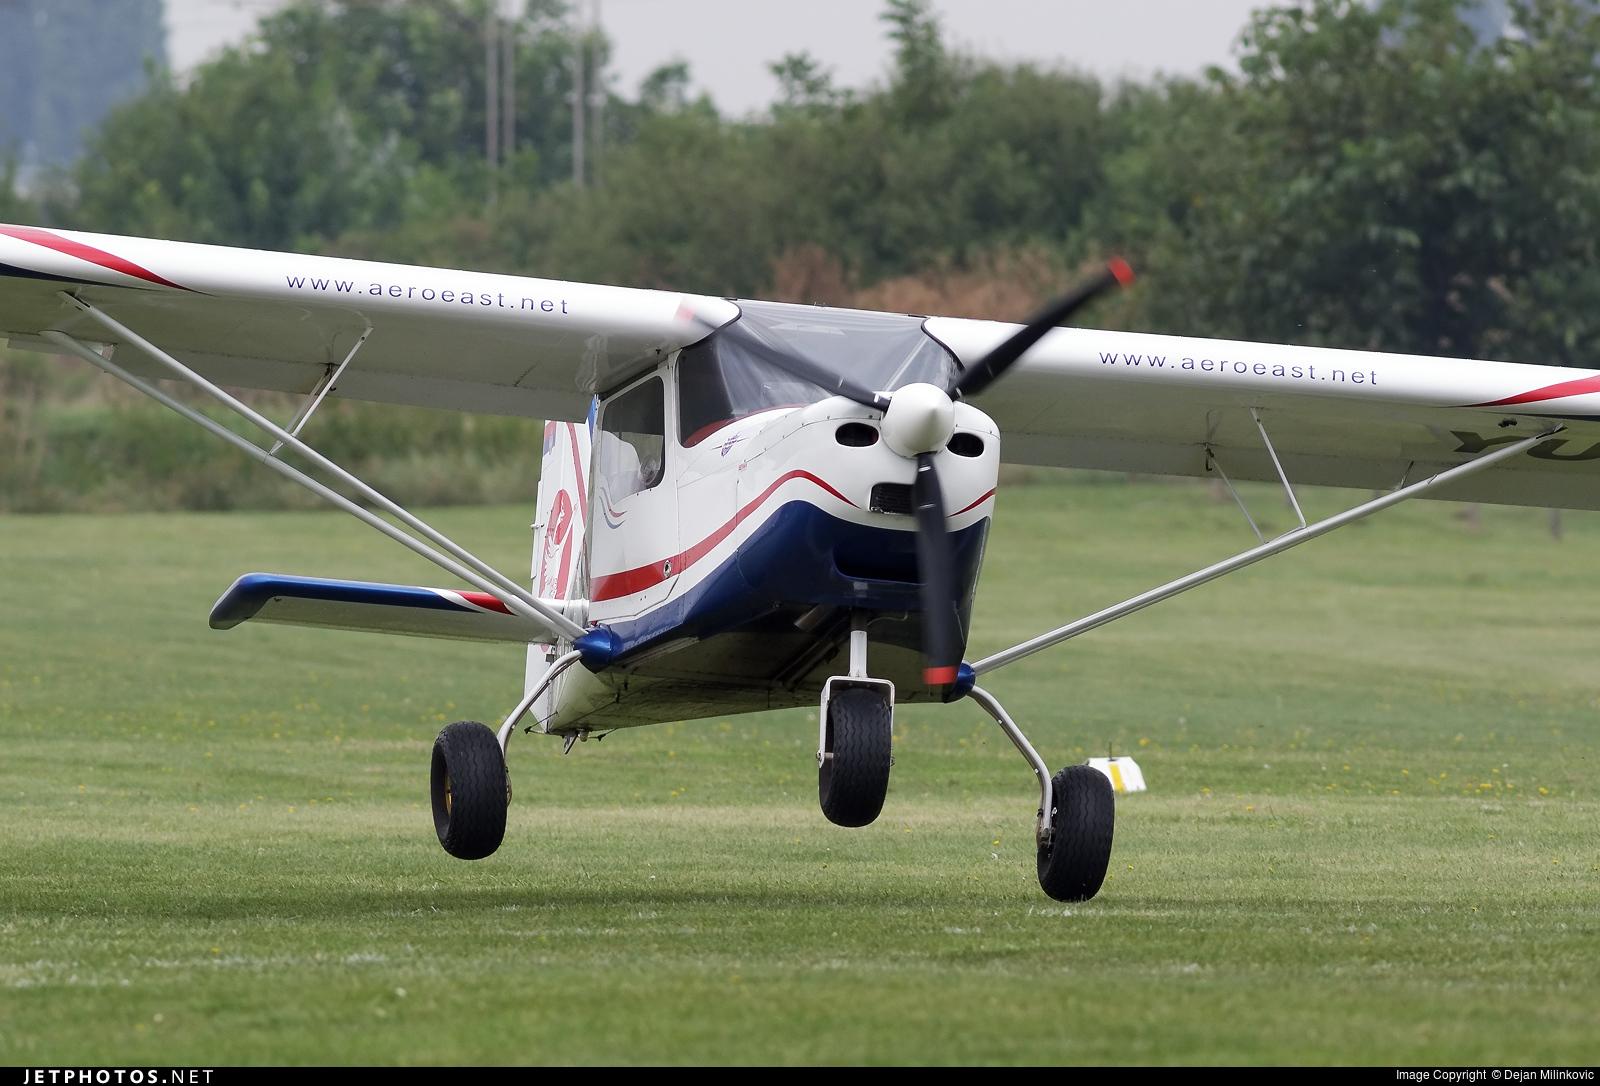 YU-A010 | Aero East Europe MXP-155 Tayrona | Aeroeast